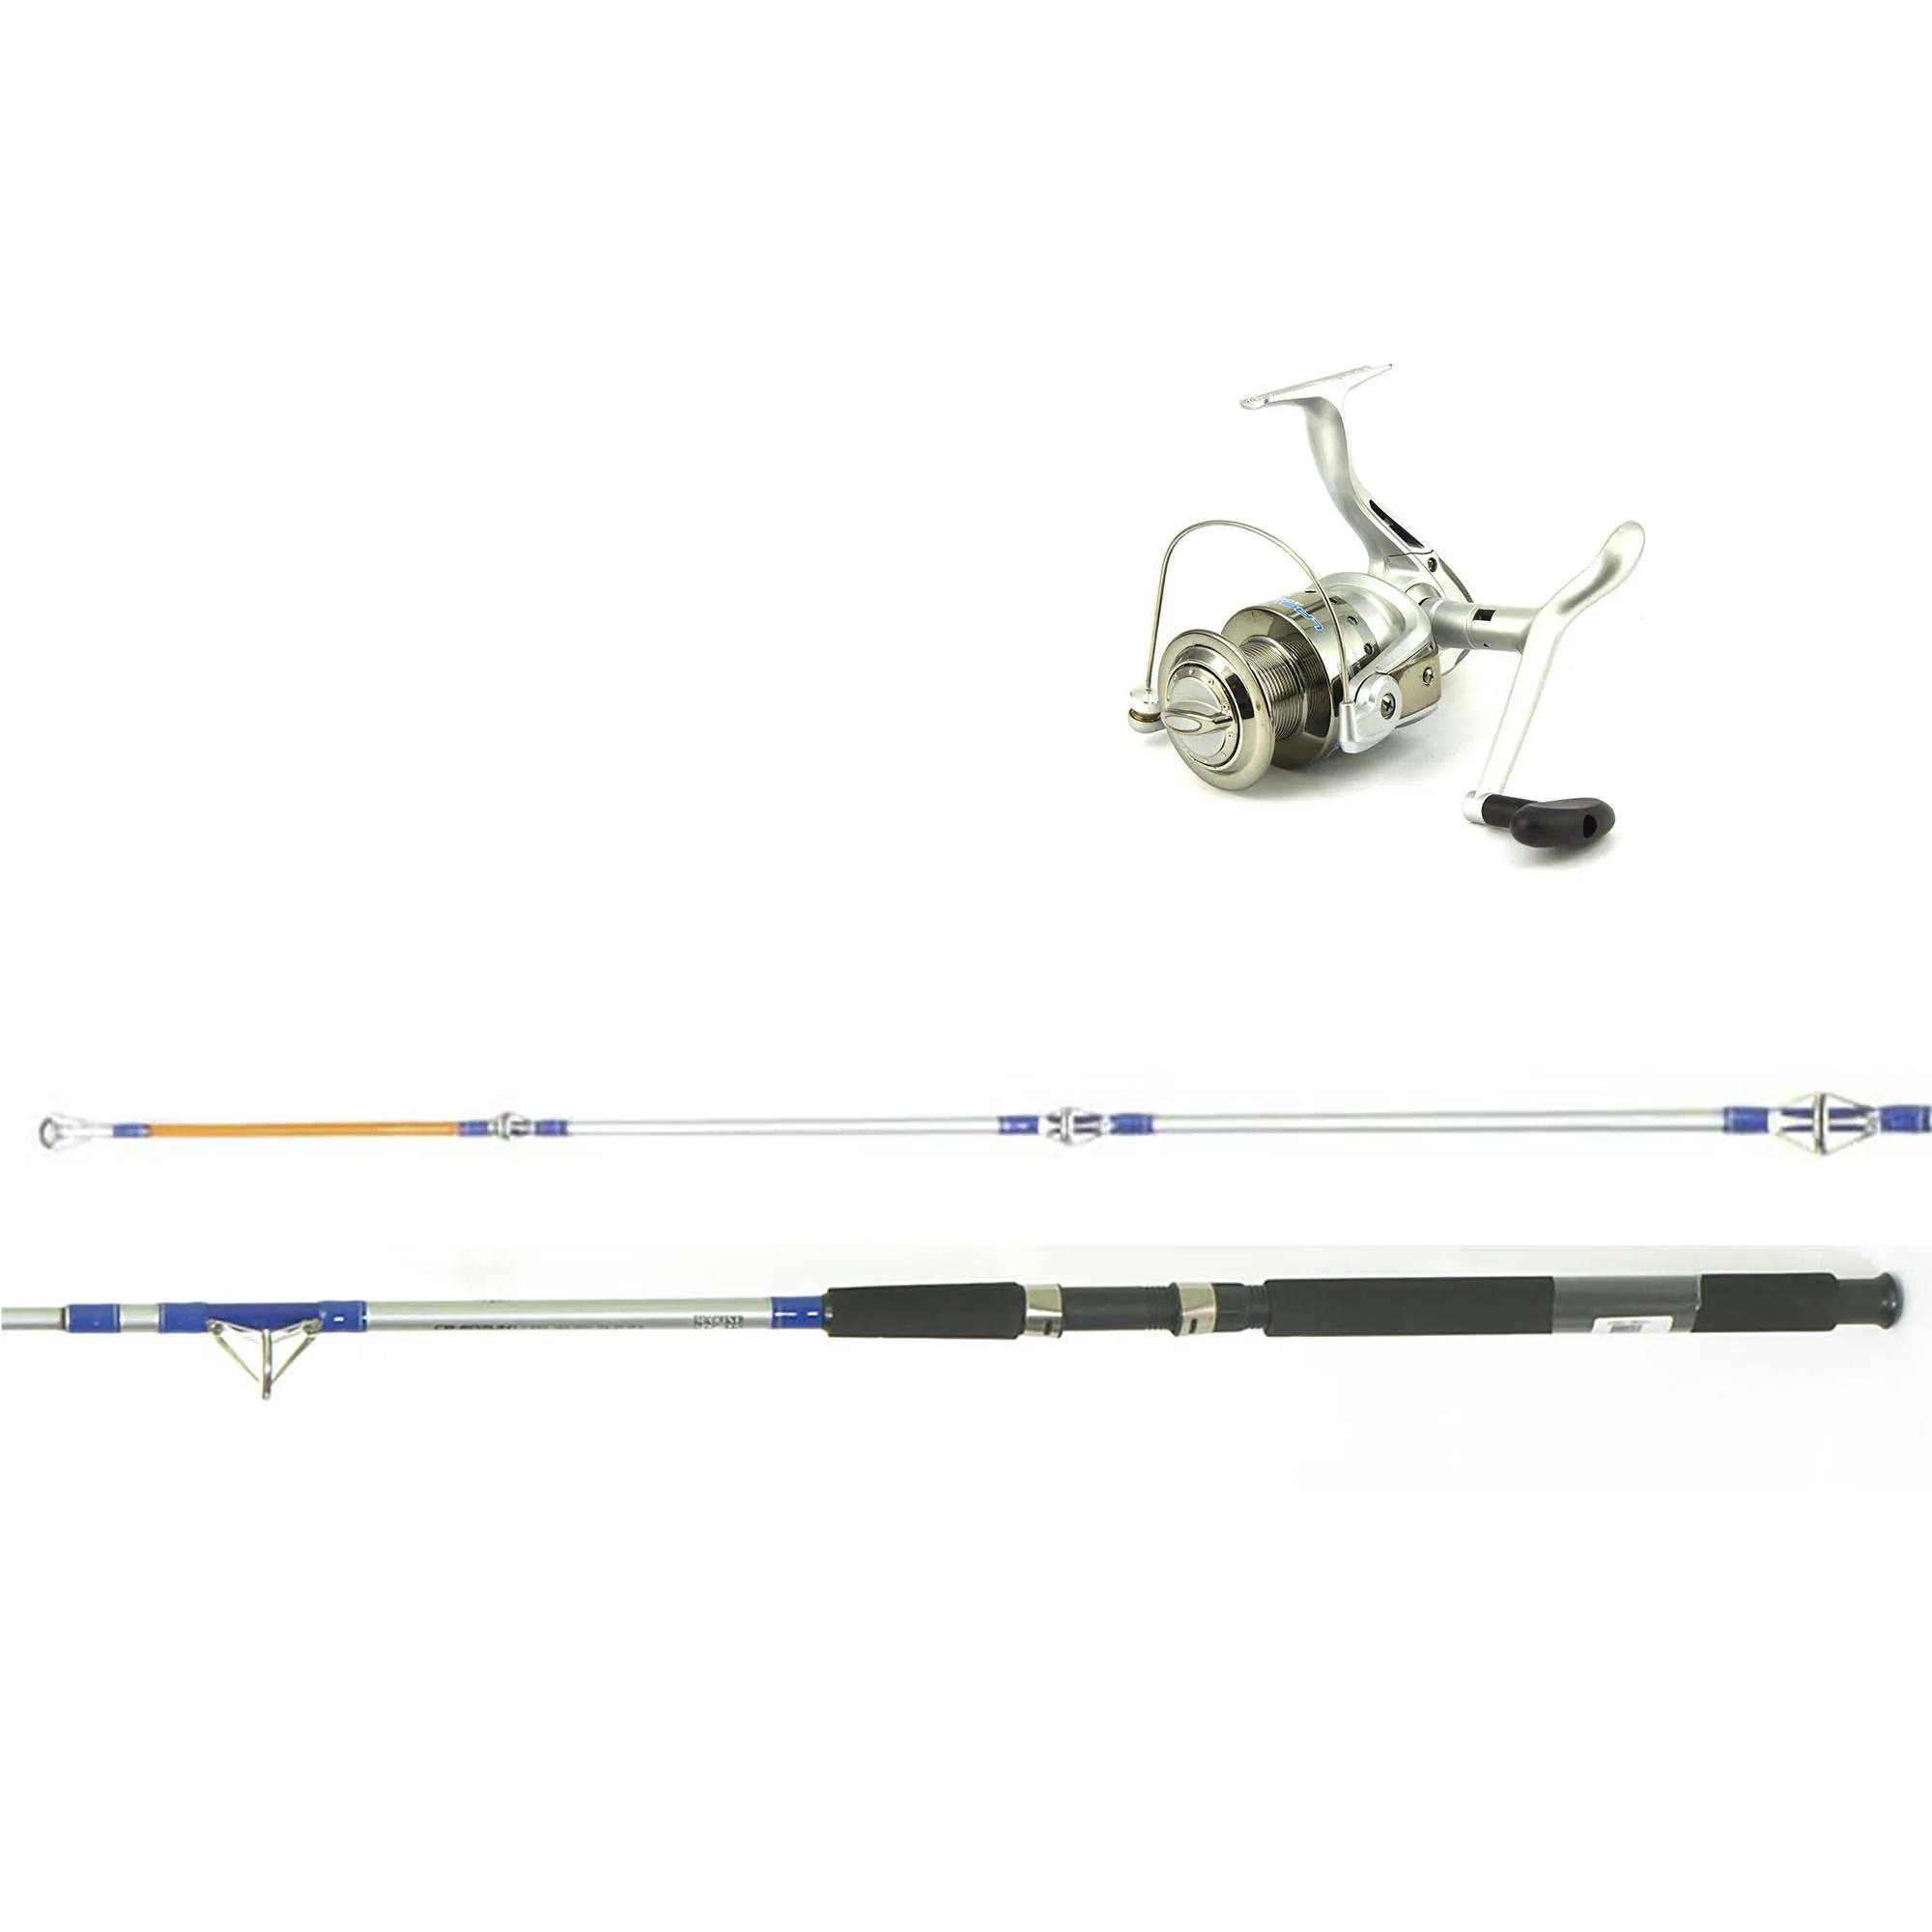 Kit Pesca PANTANAL: Vara Combat 1,83m + Molinete Laguna 4000 (5 rol.)  - Artpesca